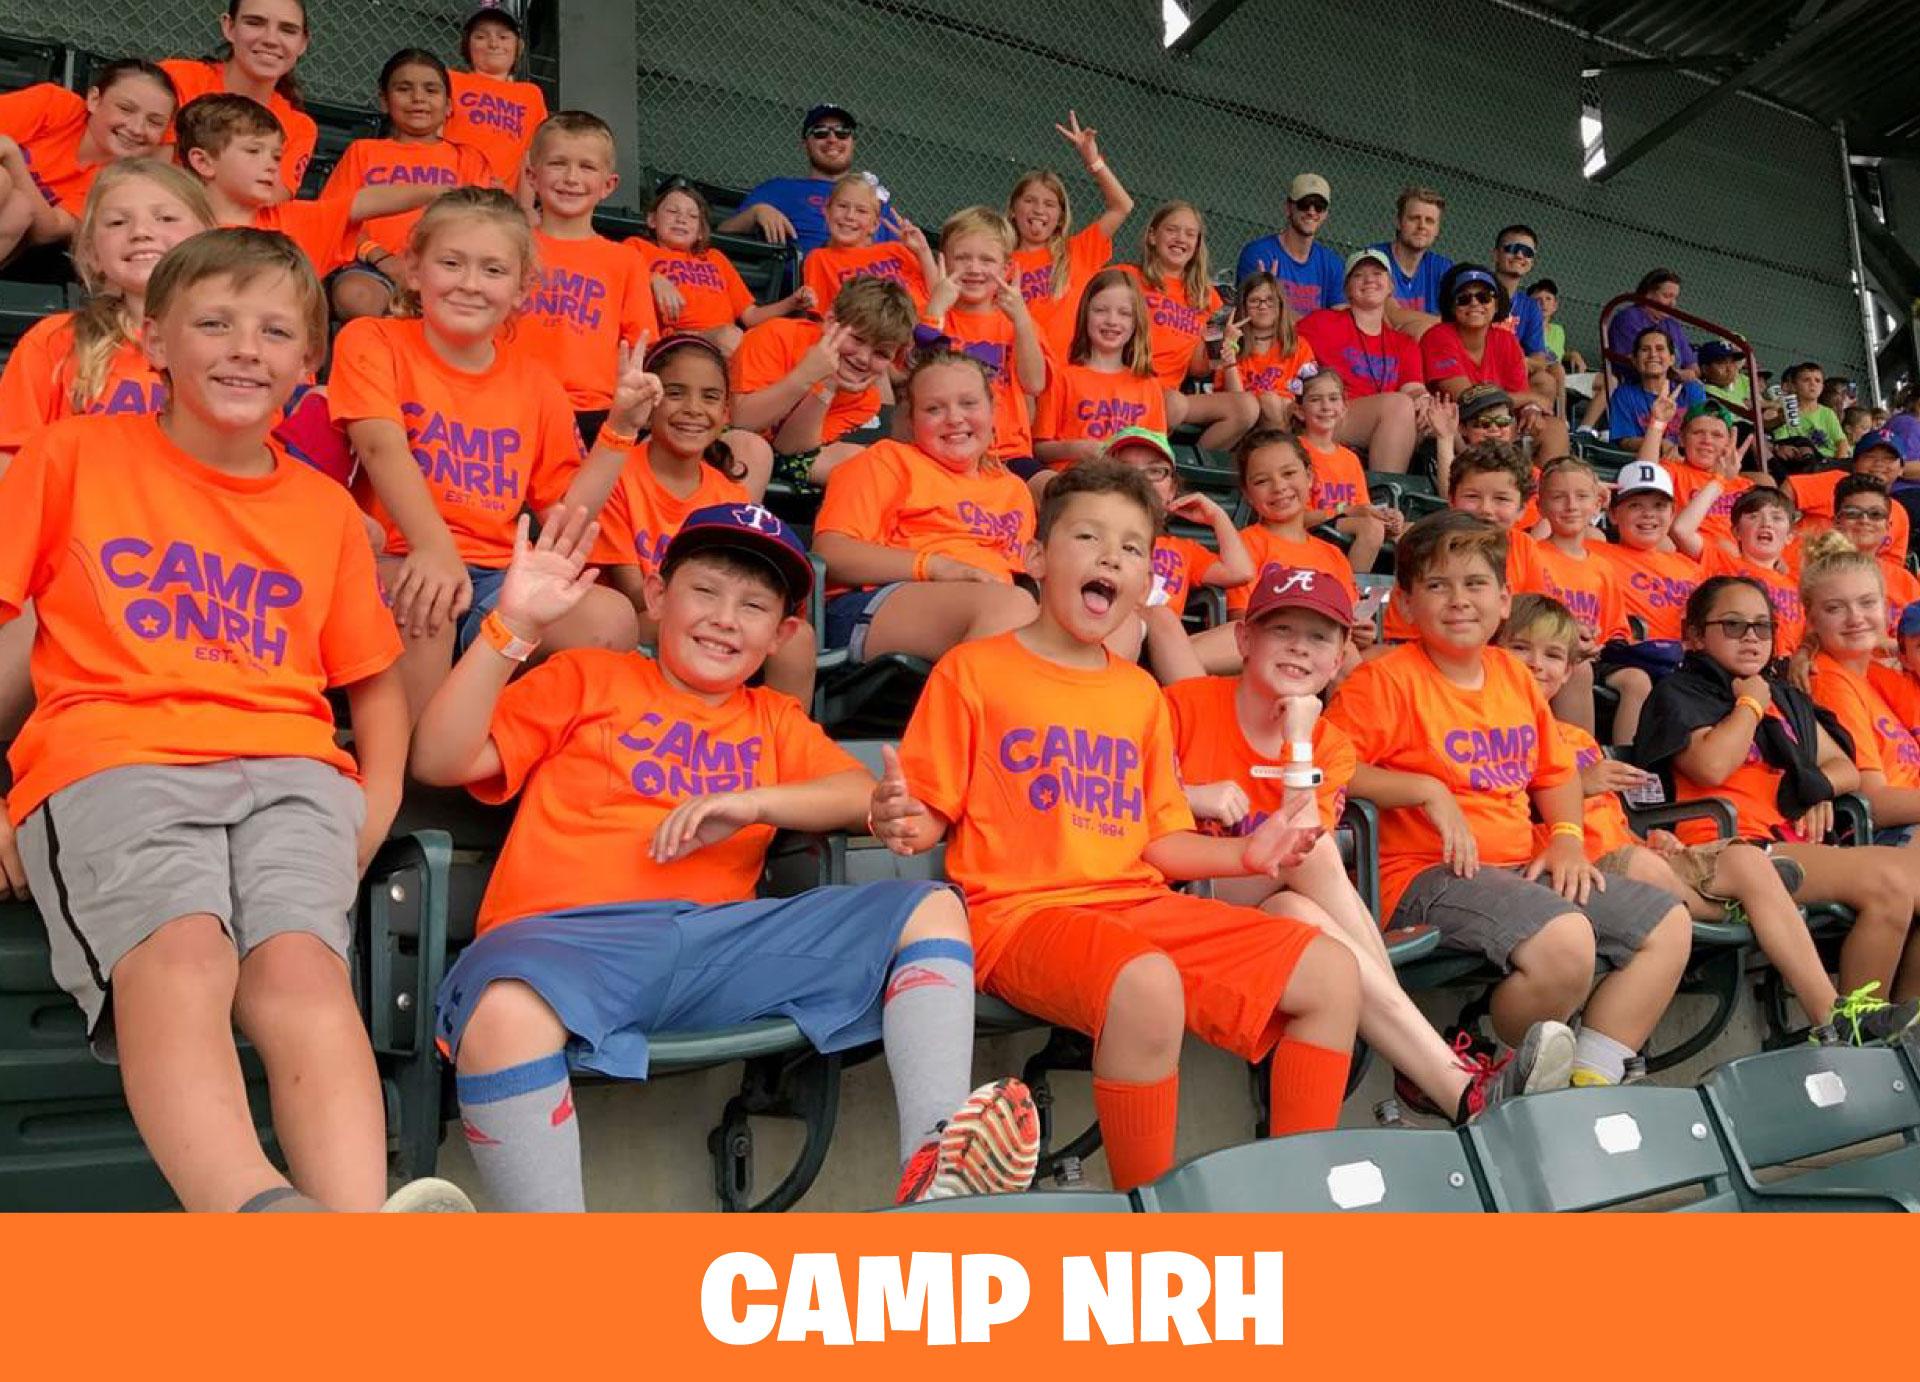 slideshow_CampNRH